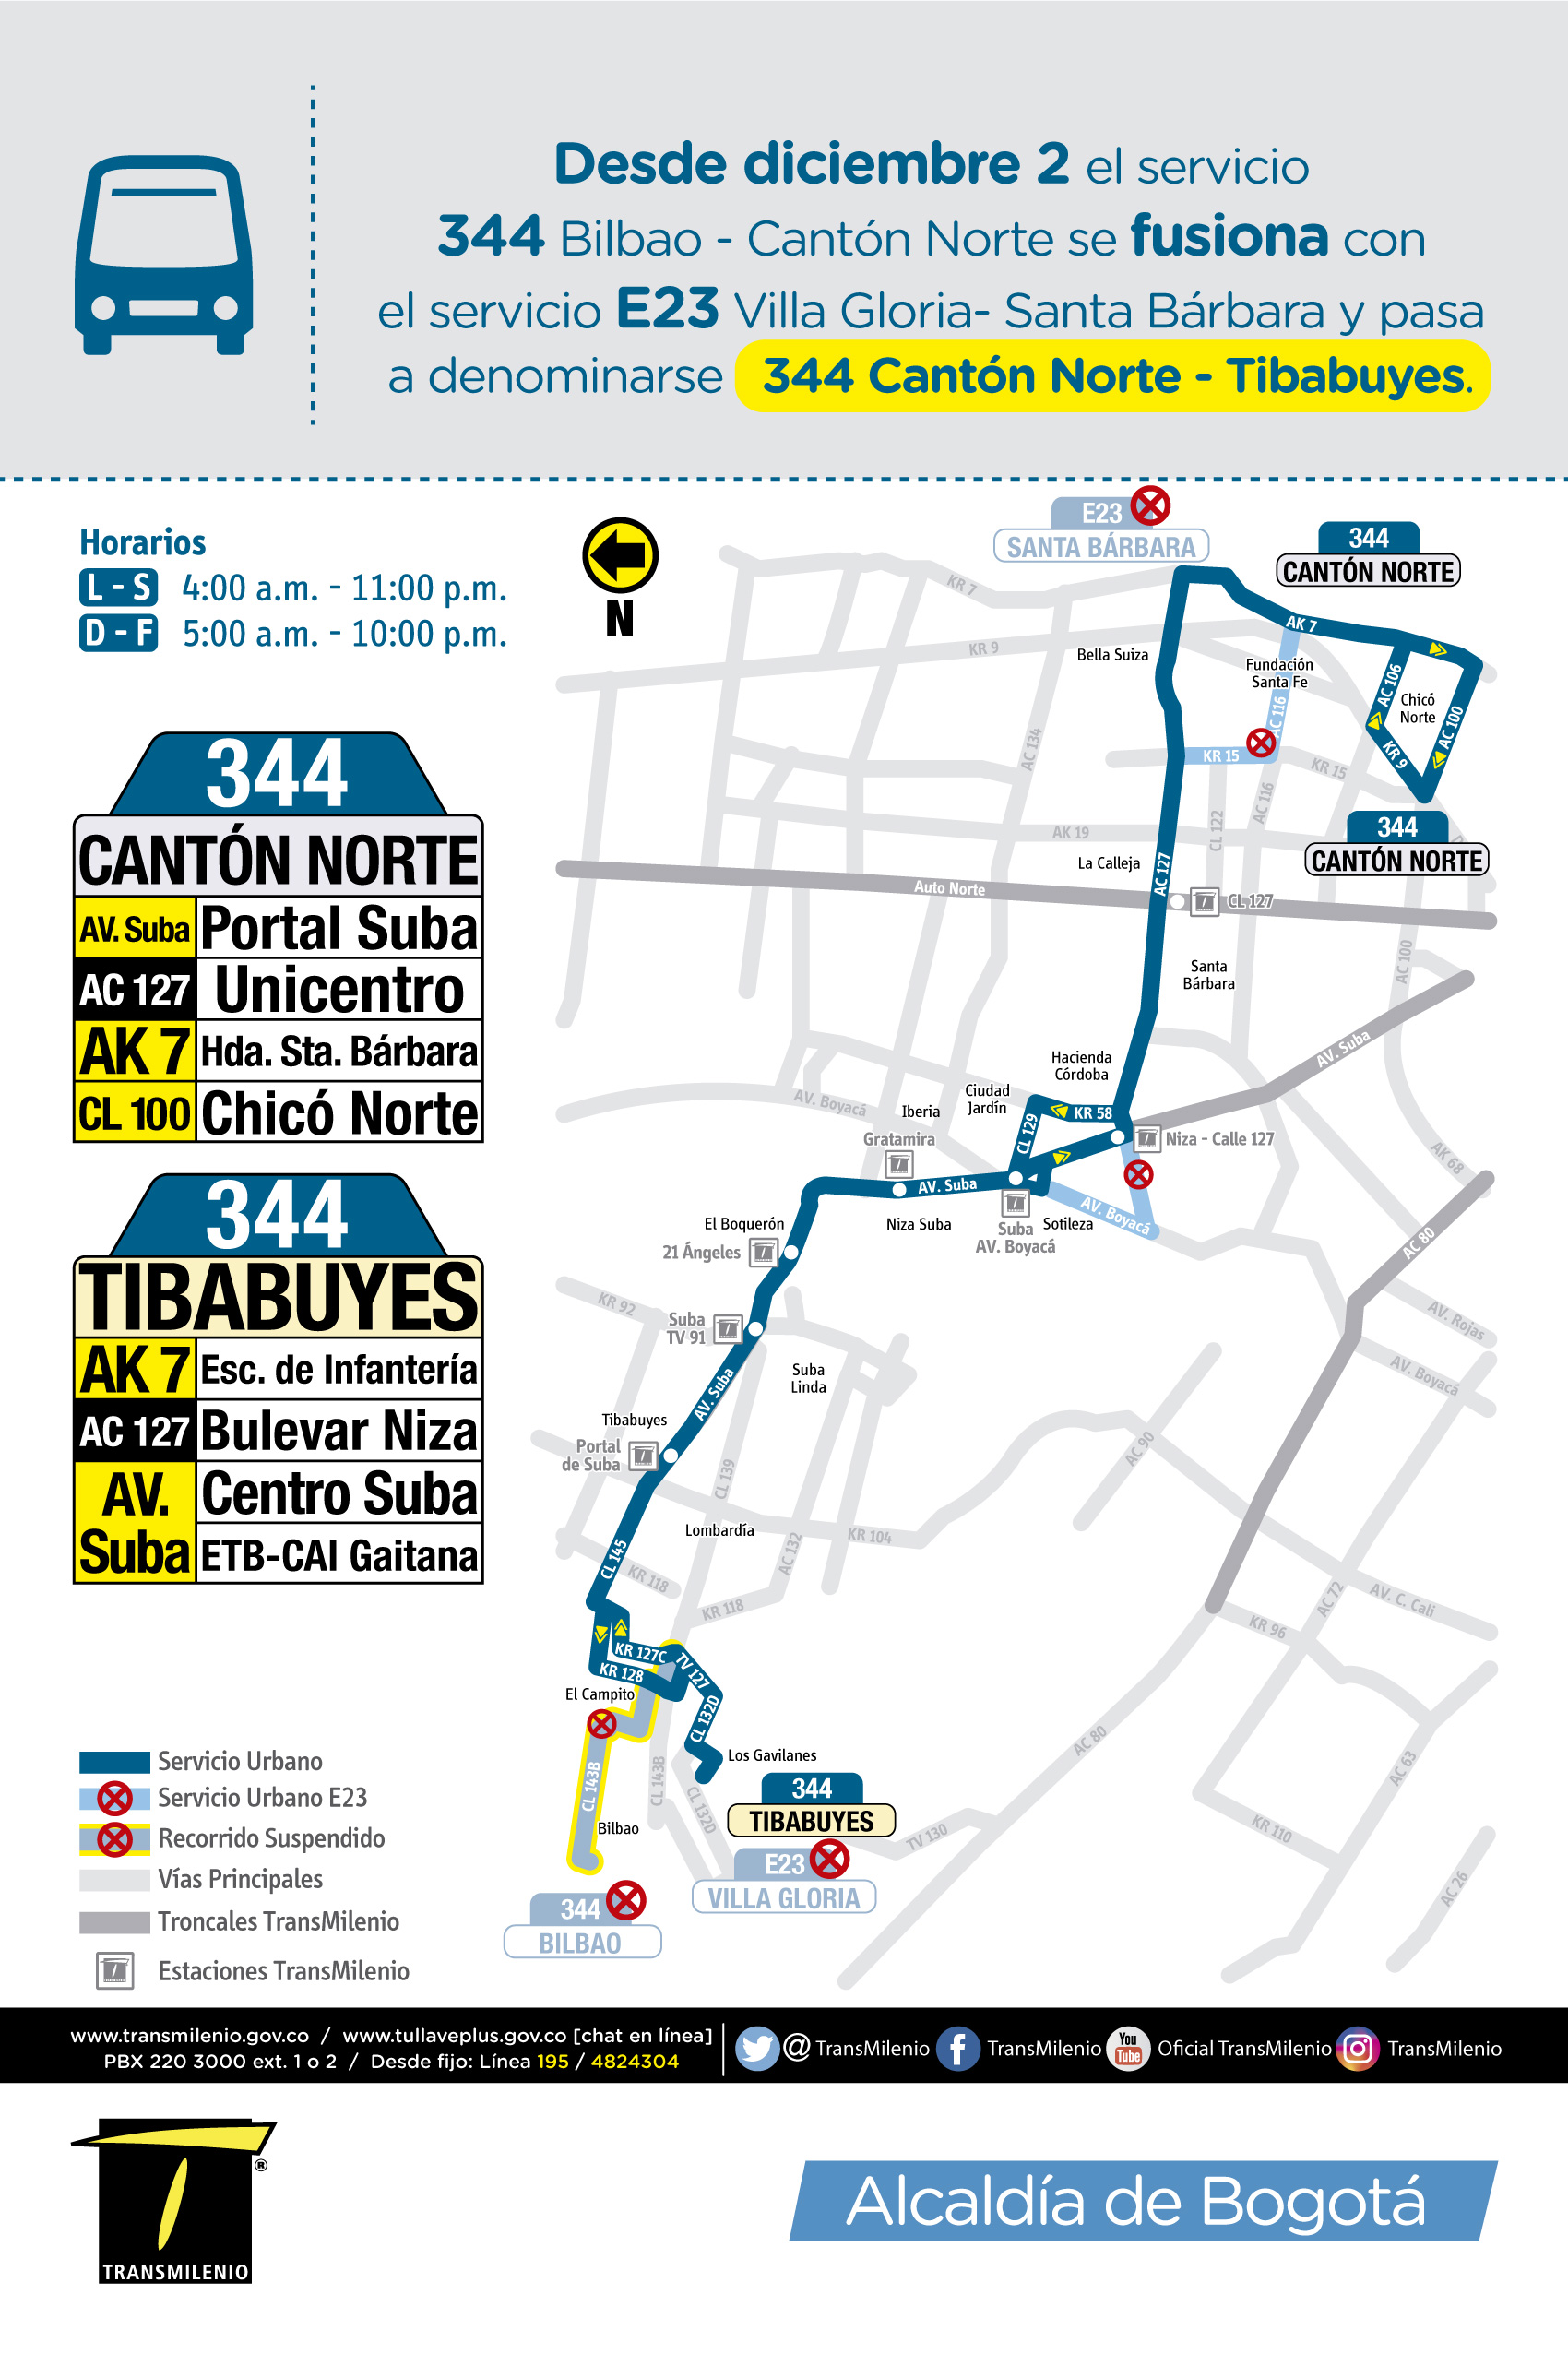 Mapa del recorrido de la ruta 344